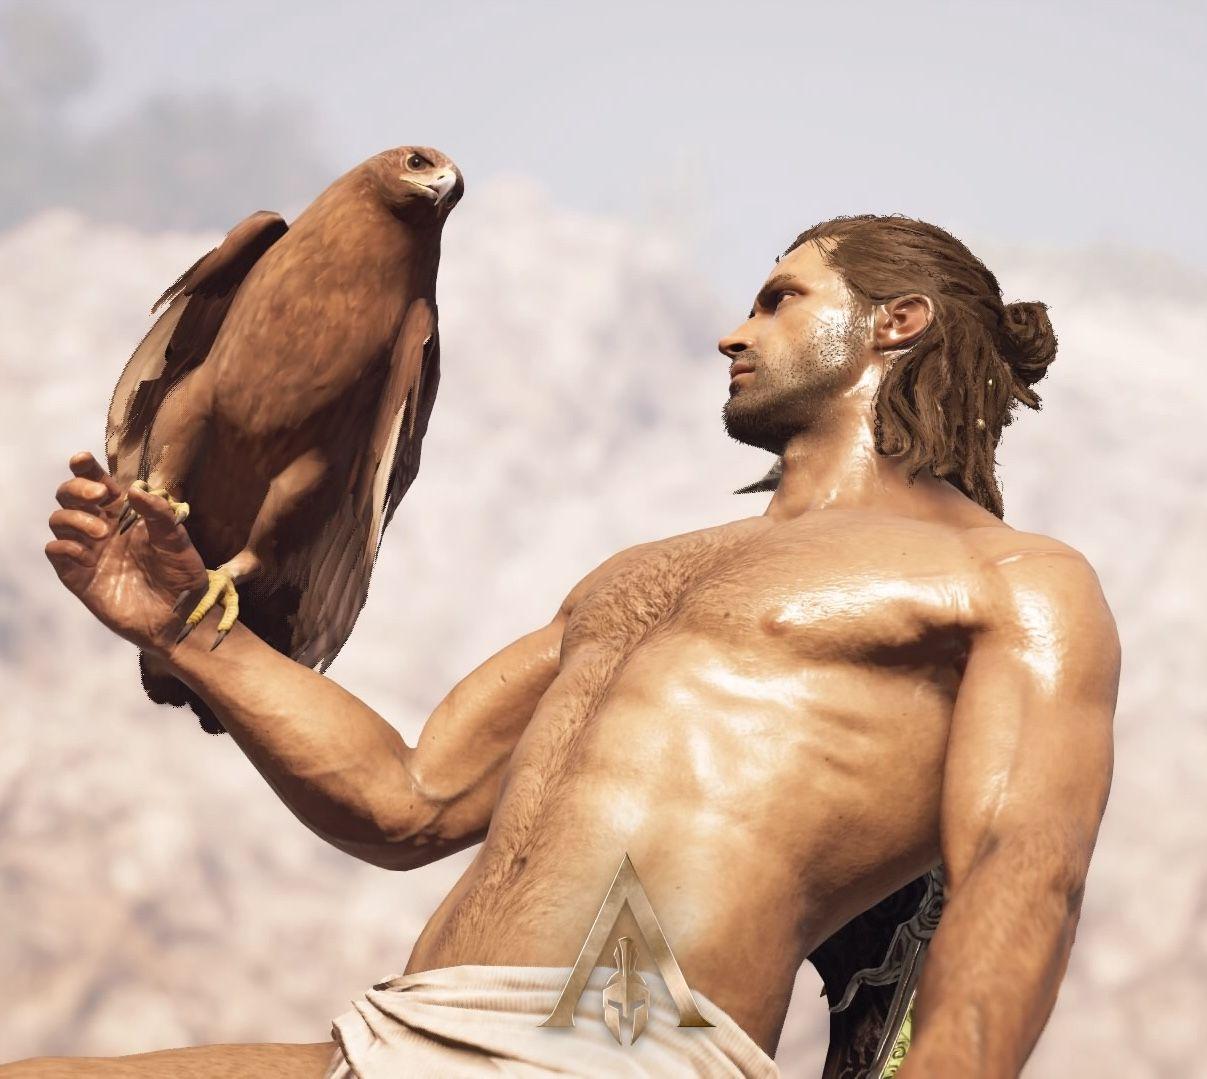 Pin By Manca Vovko On Assassin S Creed Assassin S Creed